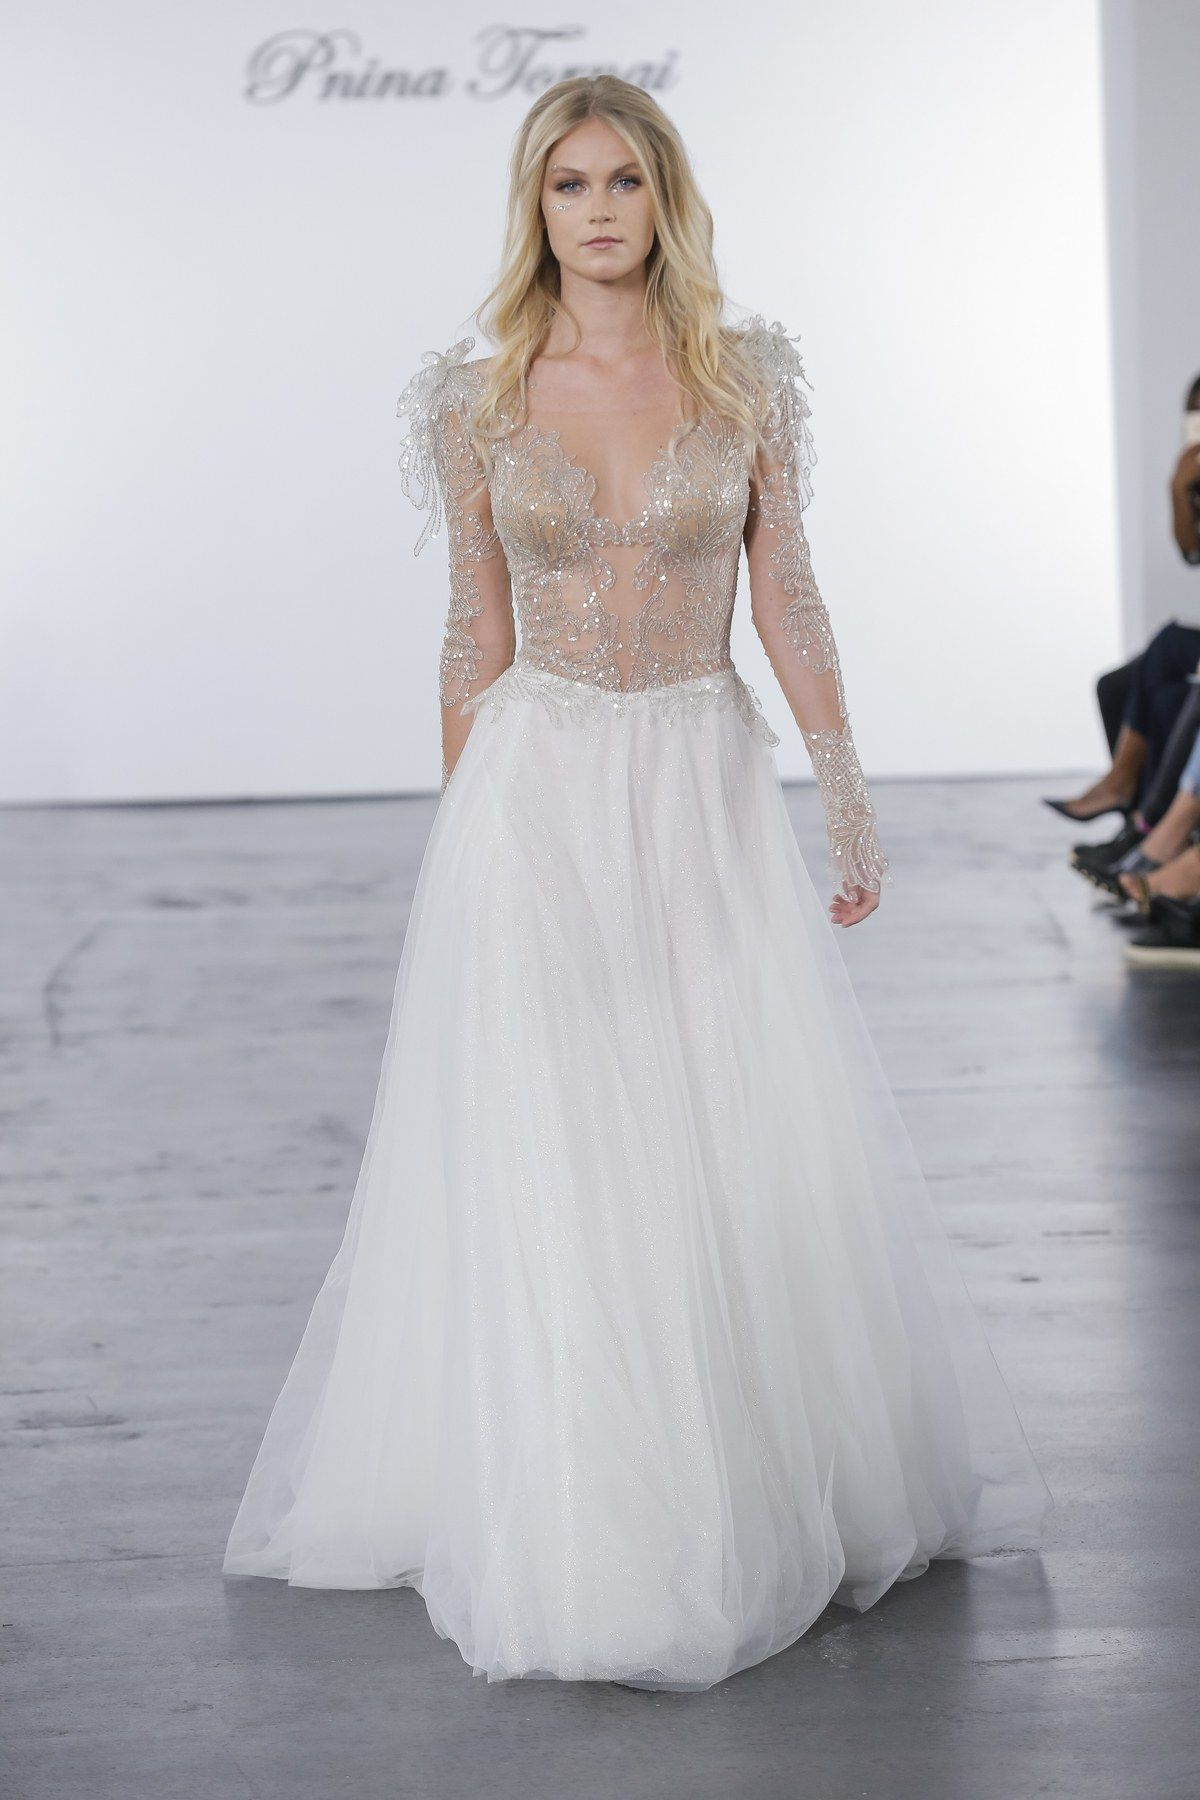 Pnina wedding dress  Wedding dress by Pnina Tornai for Kleinfeld  Wedding dresses